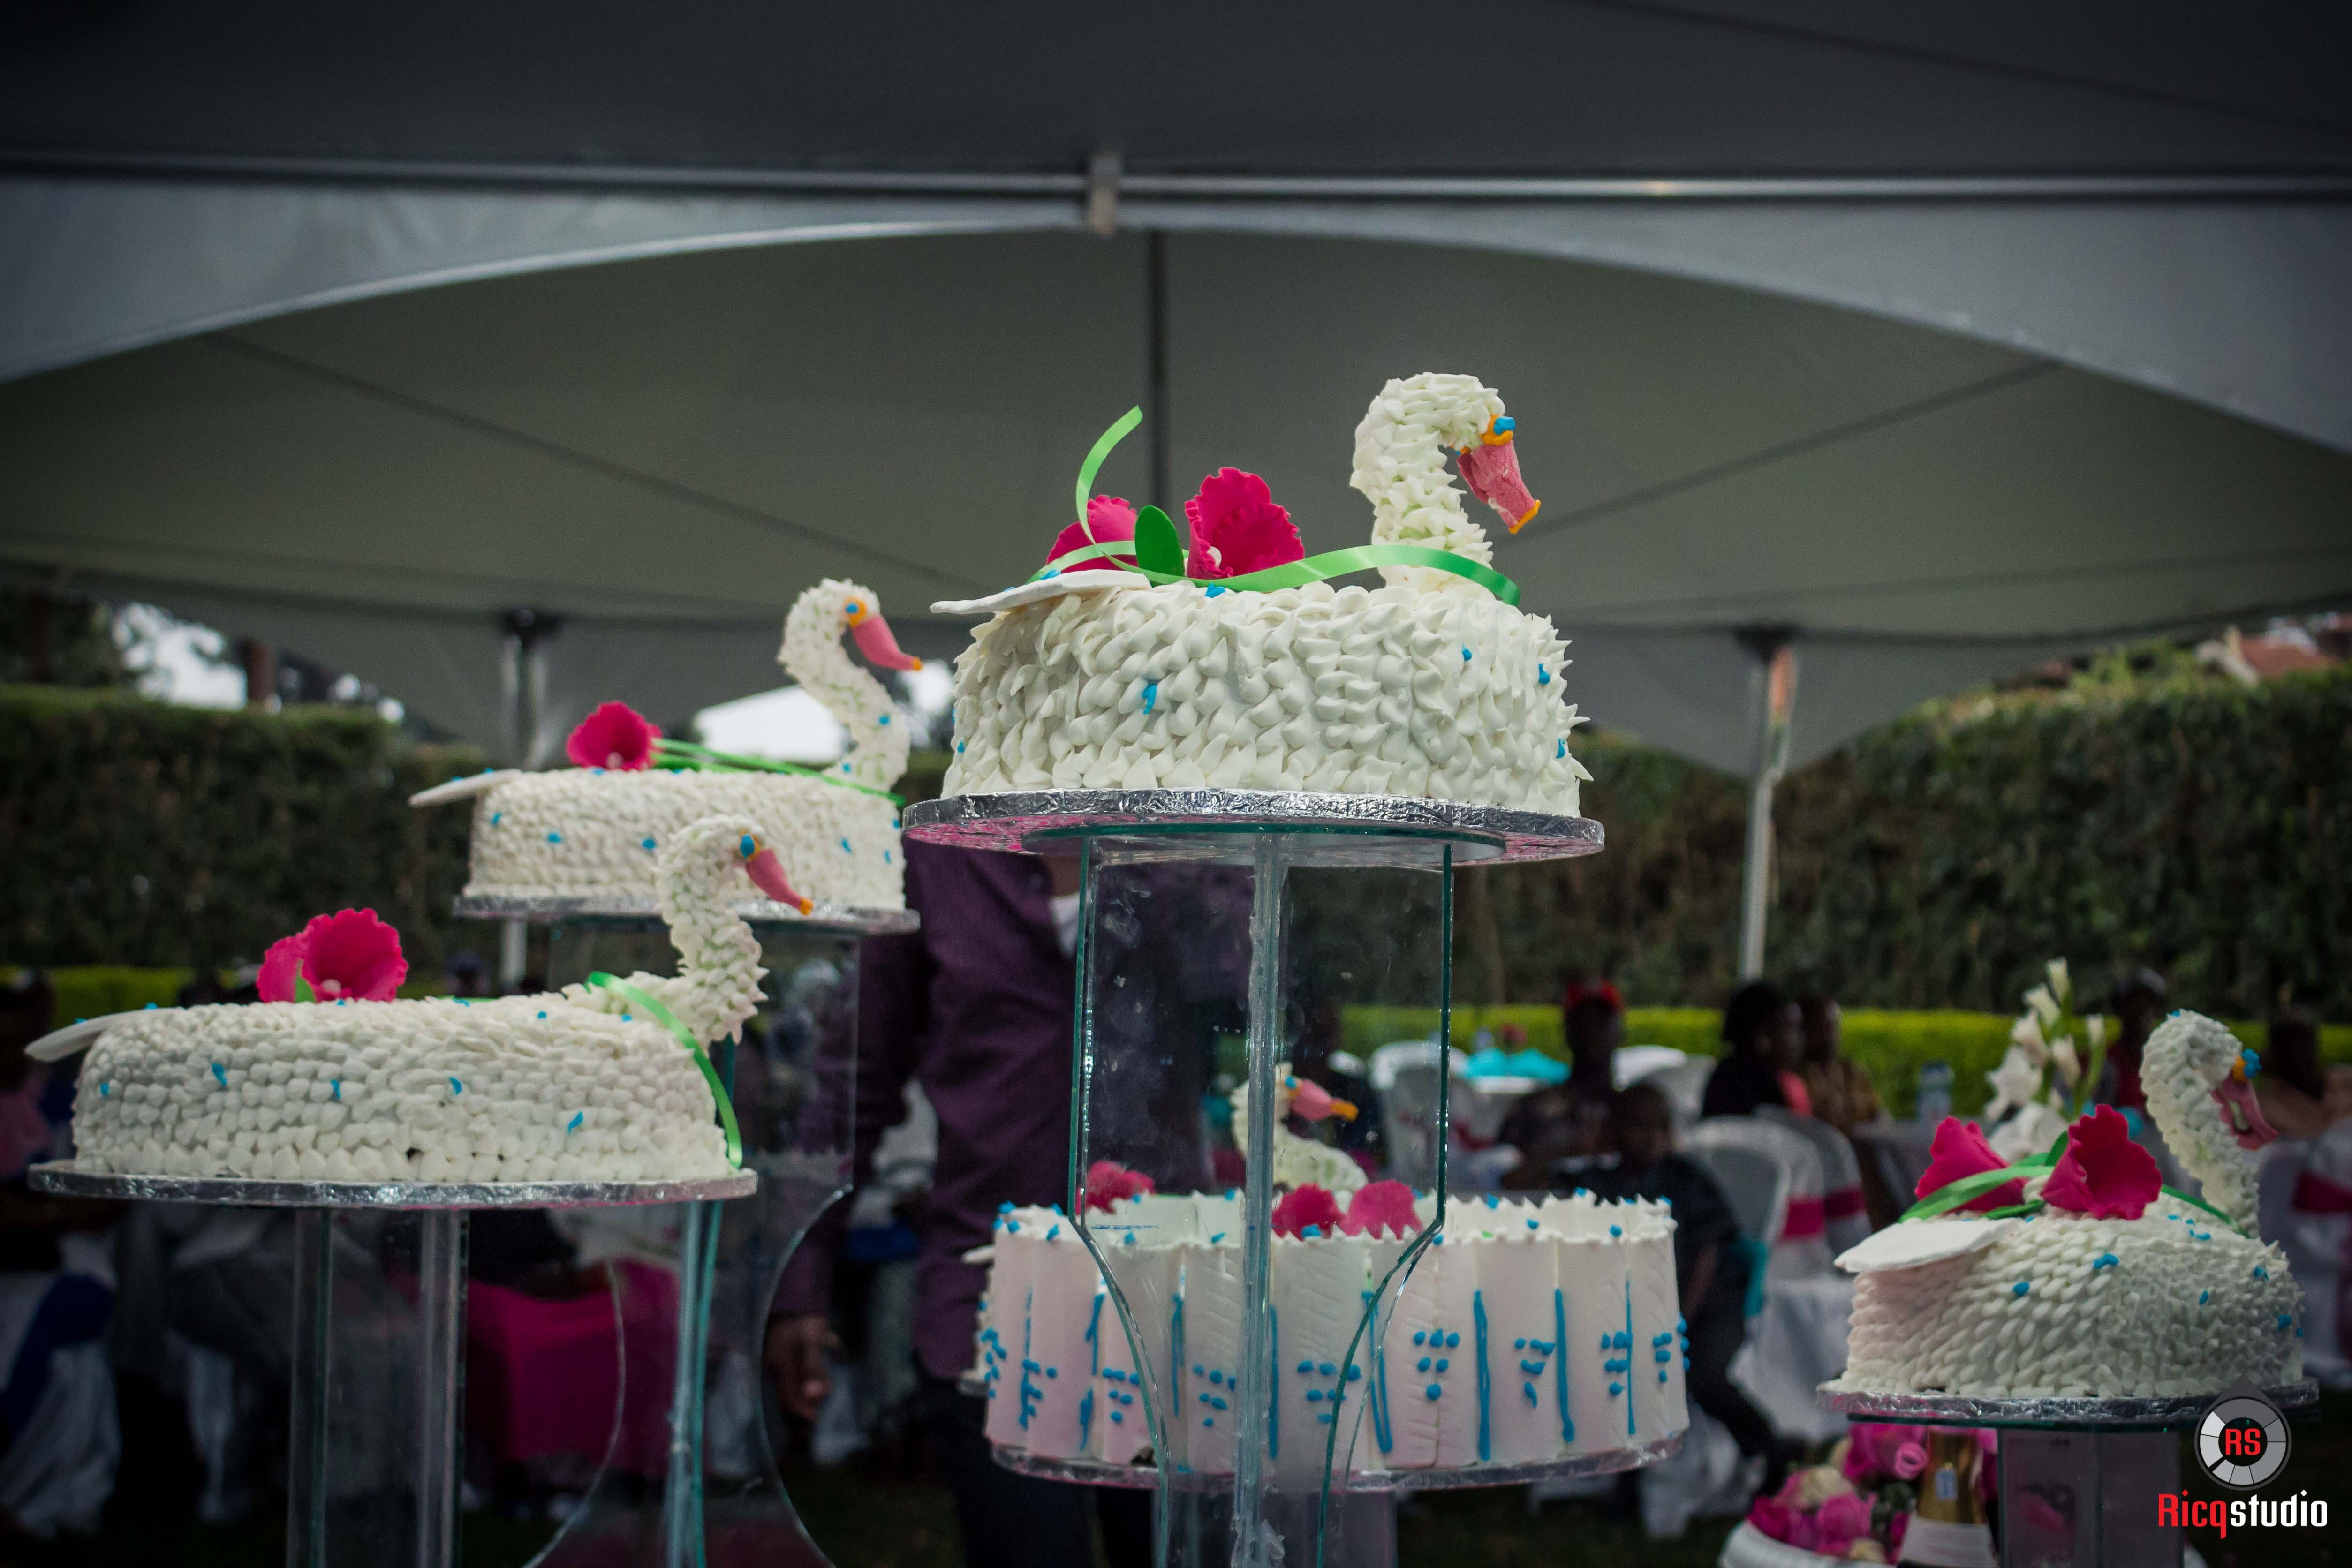 that cake :)